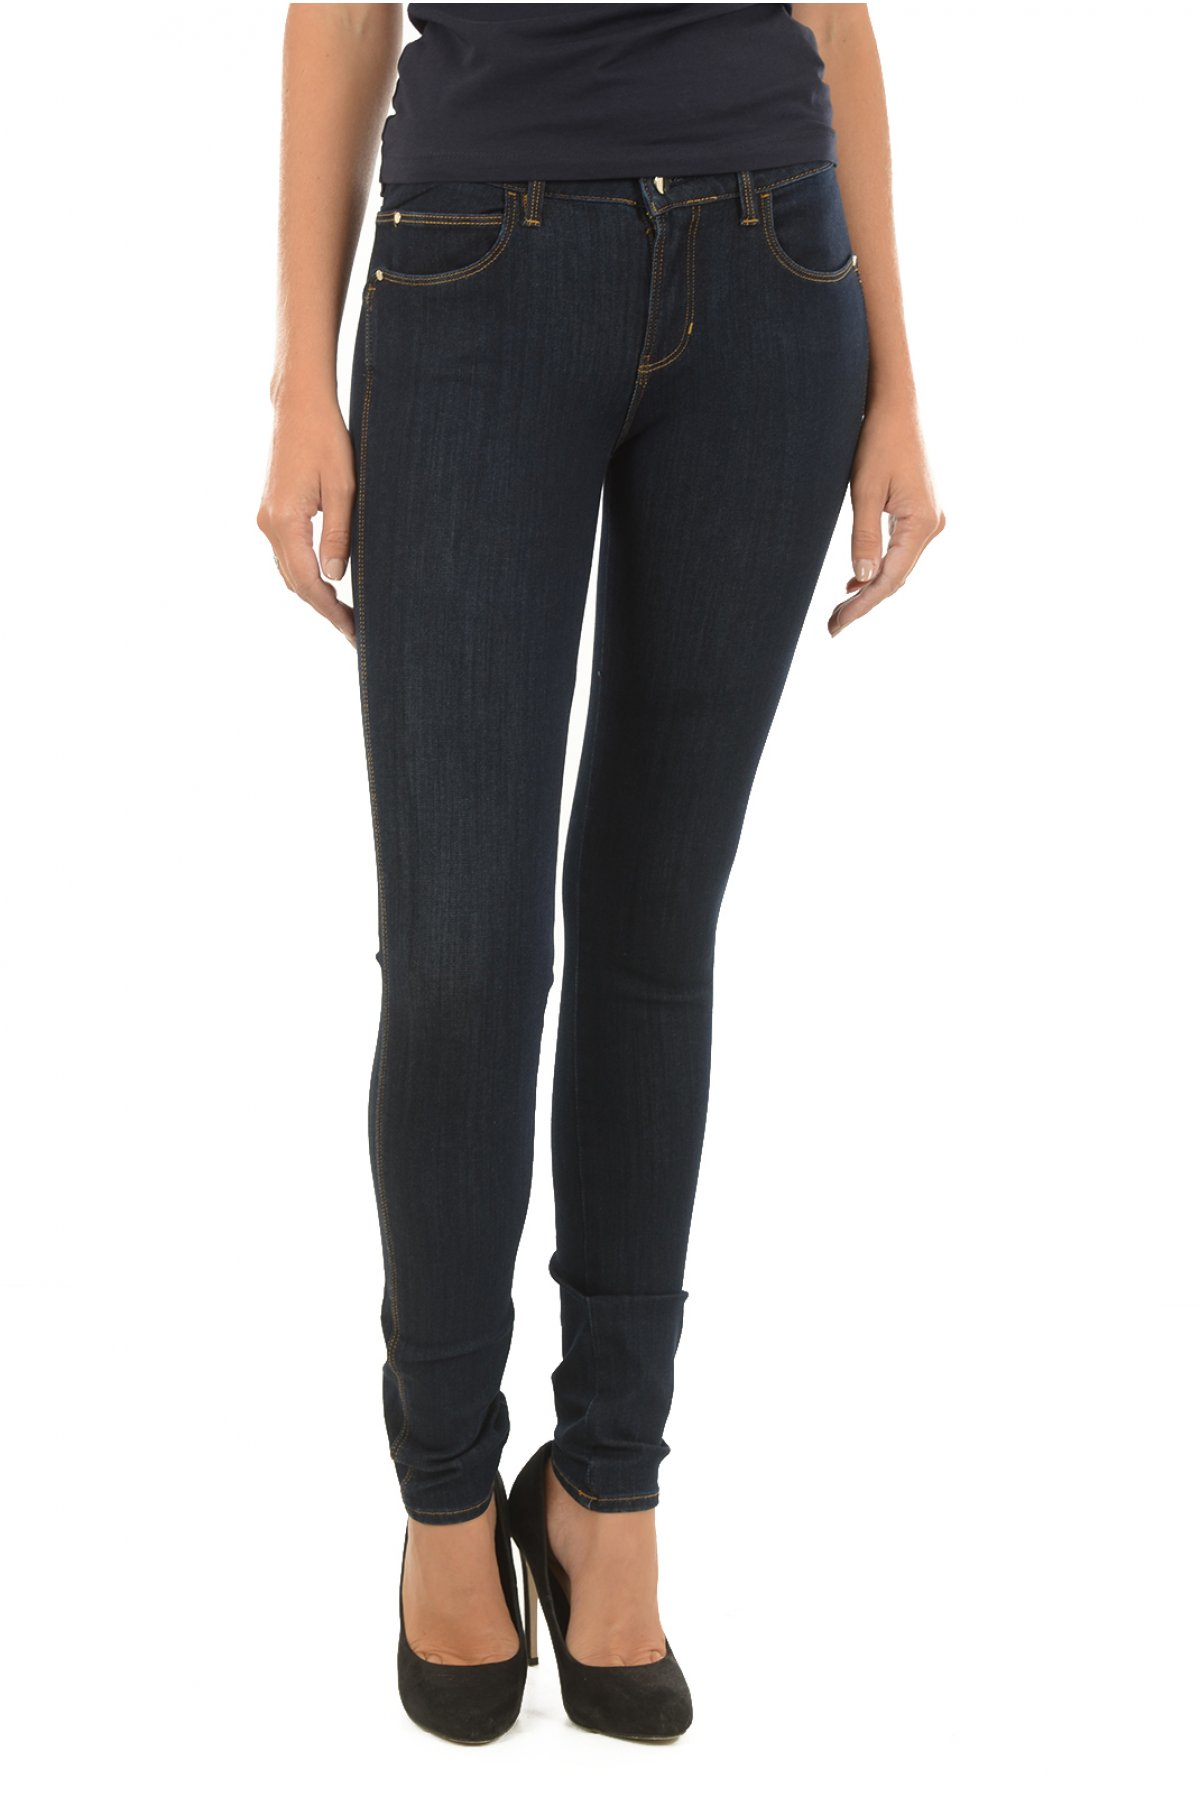 Jeans Jeans Femme 24,25,26,27,28,30